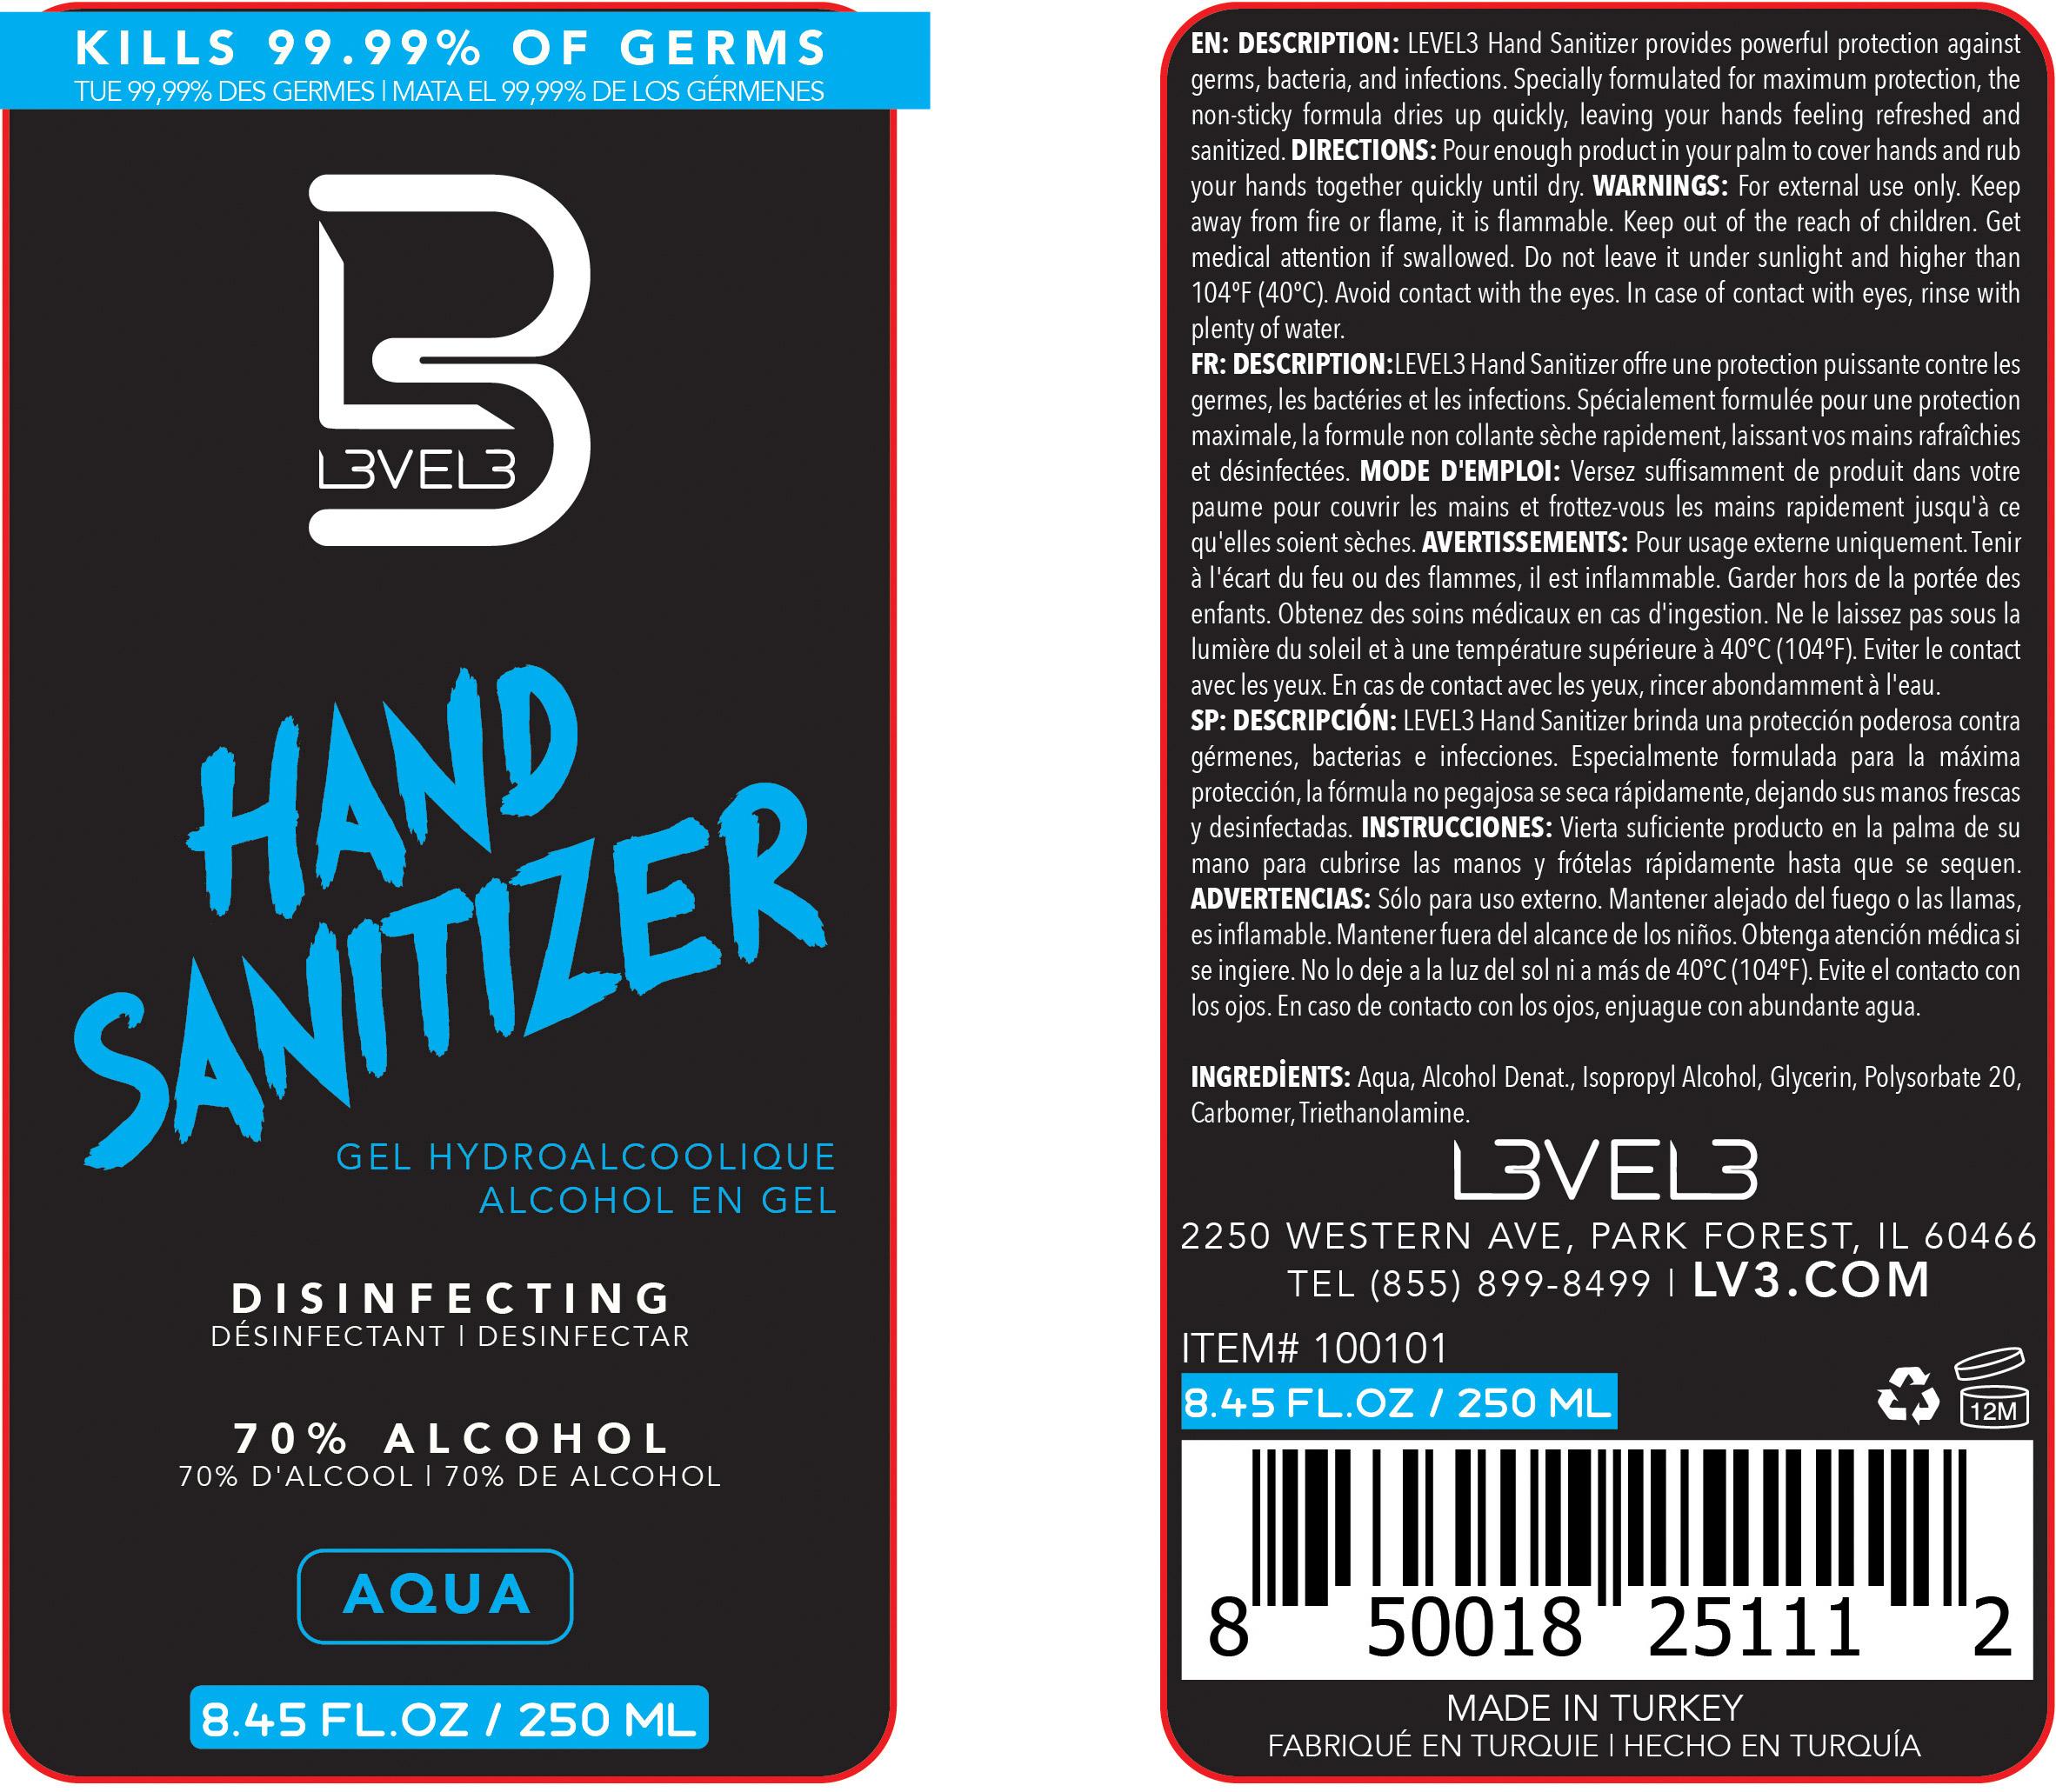 Aqua 250 ml Label